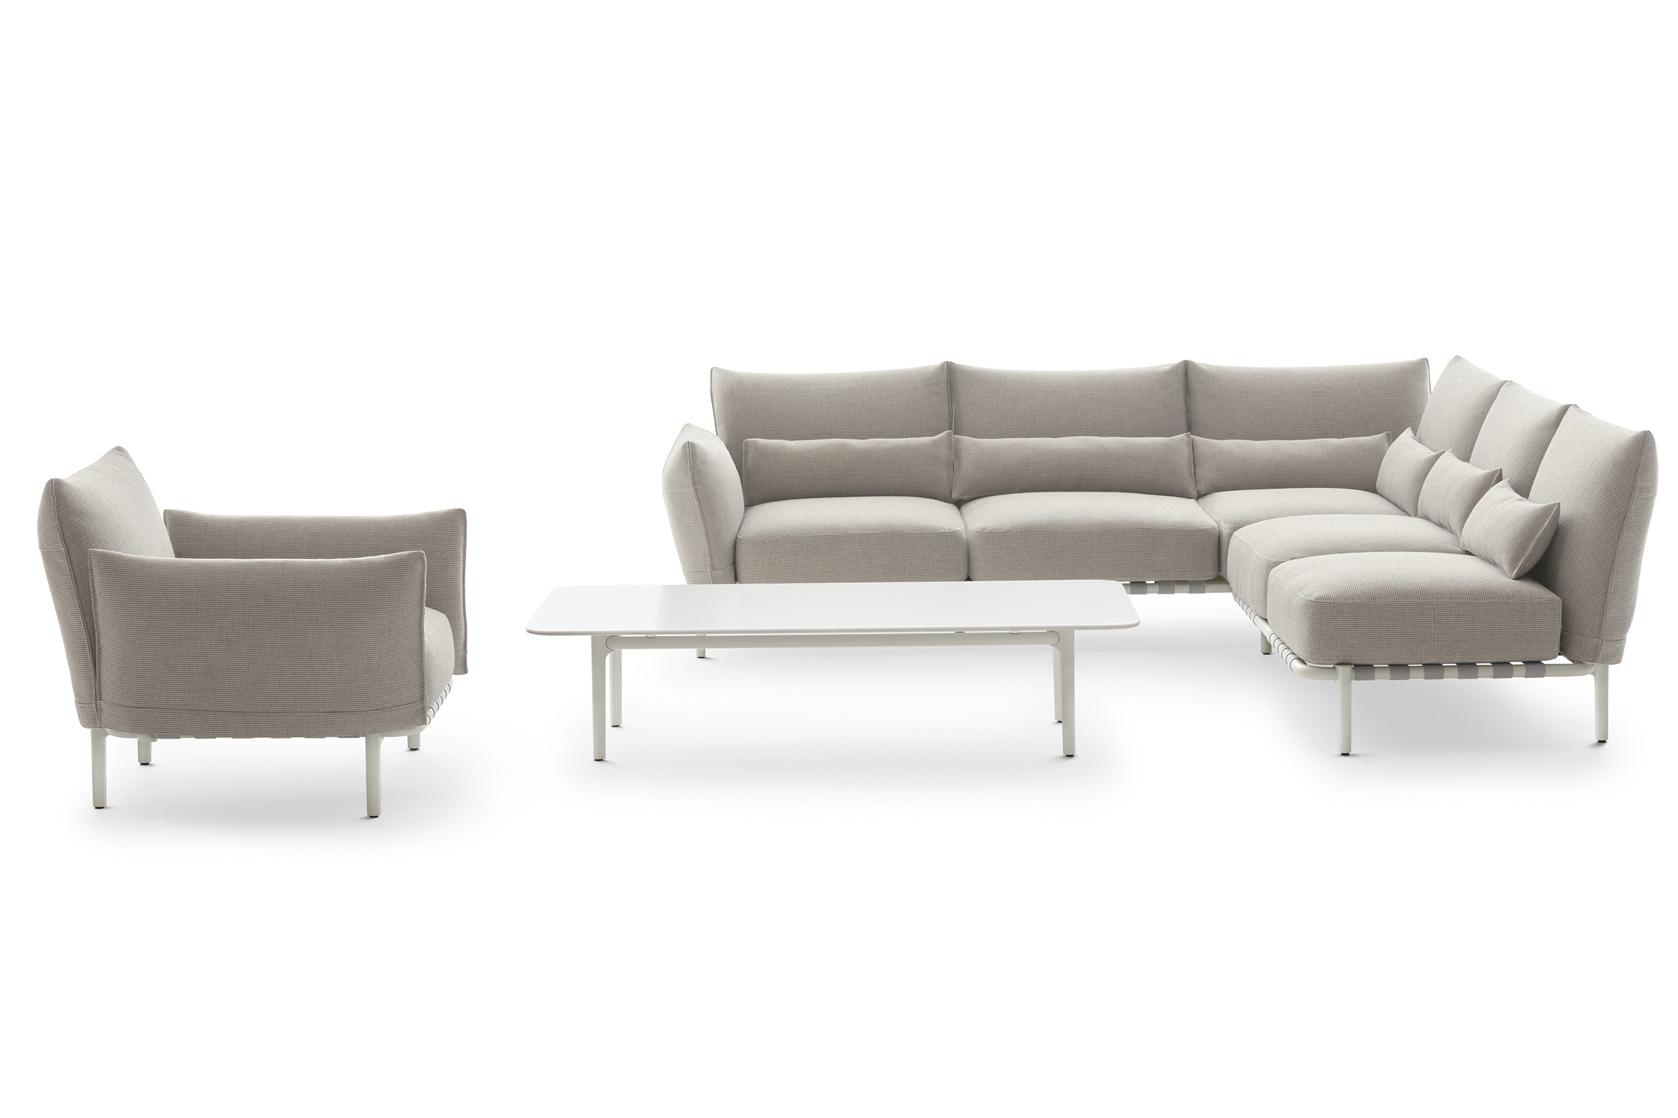 barber-osgerbys-brea-adaptable-modular-lounge-system-dedon-designboom-1800.jpg